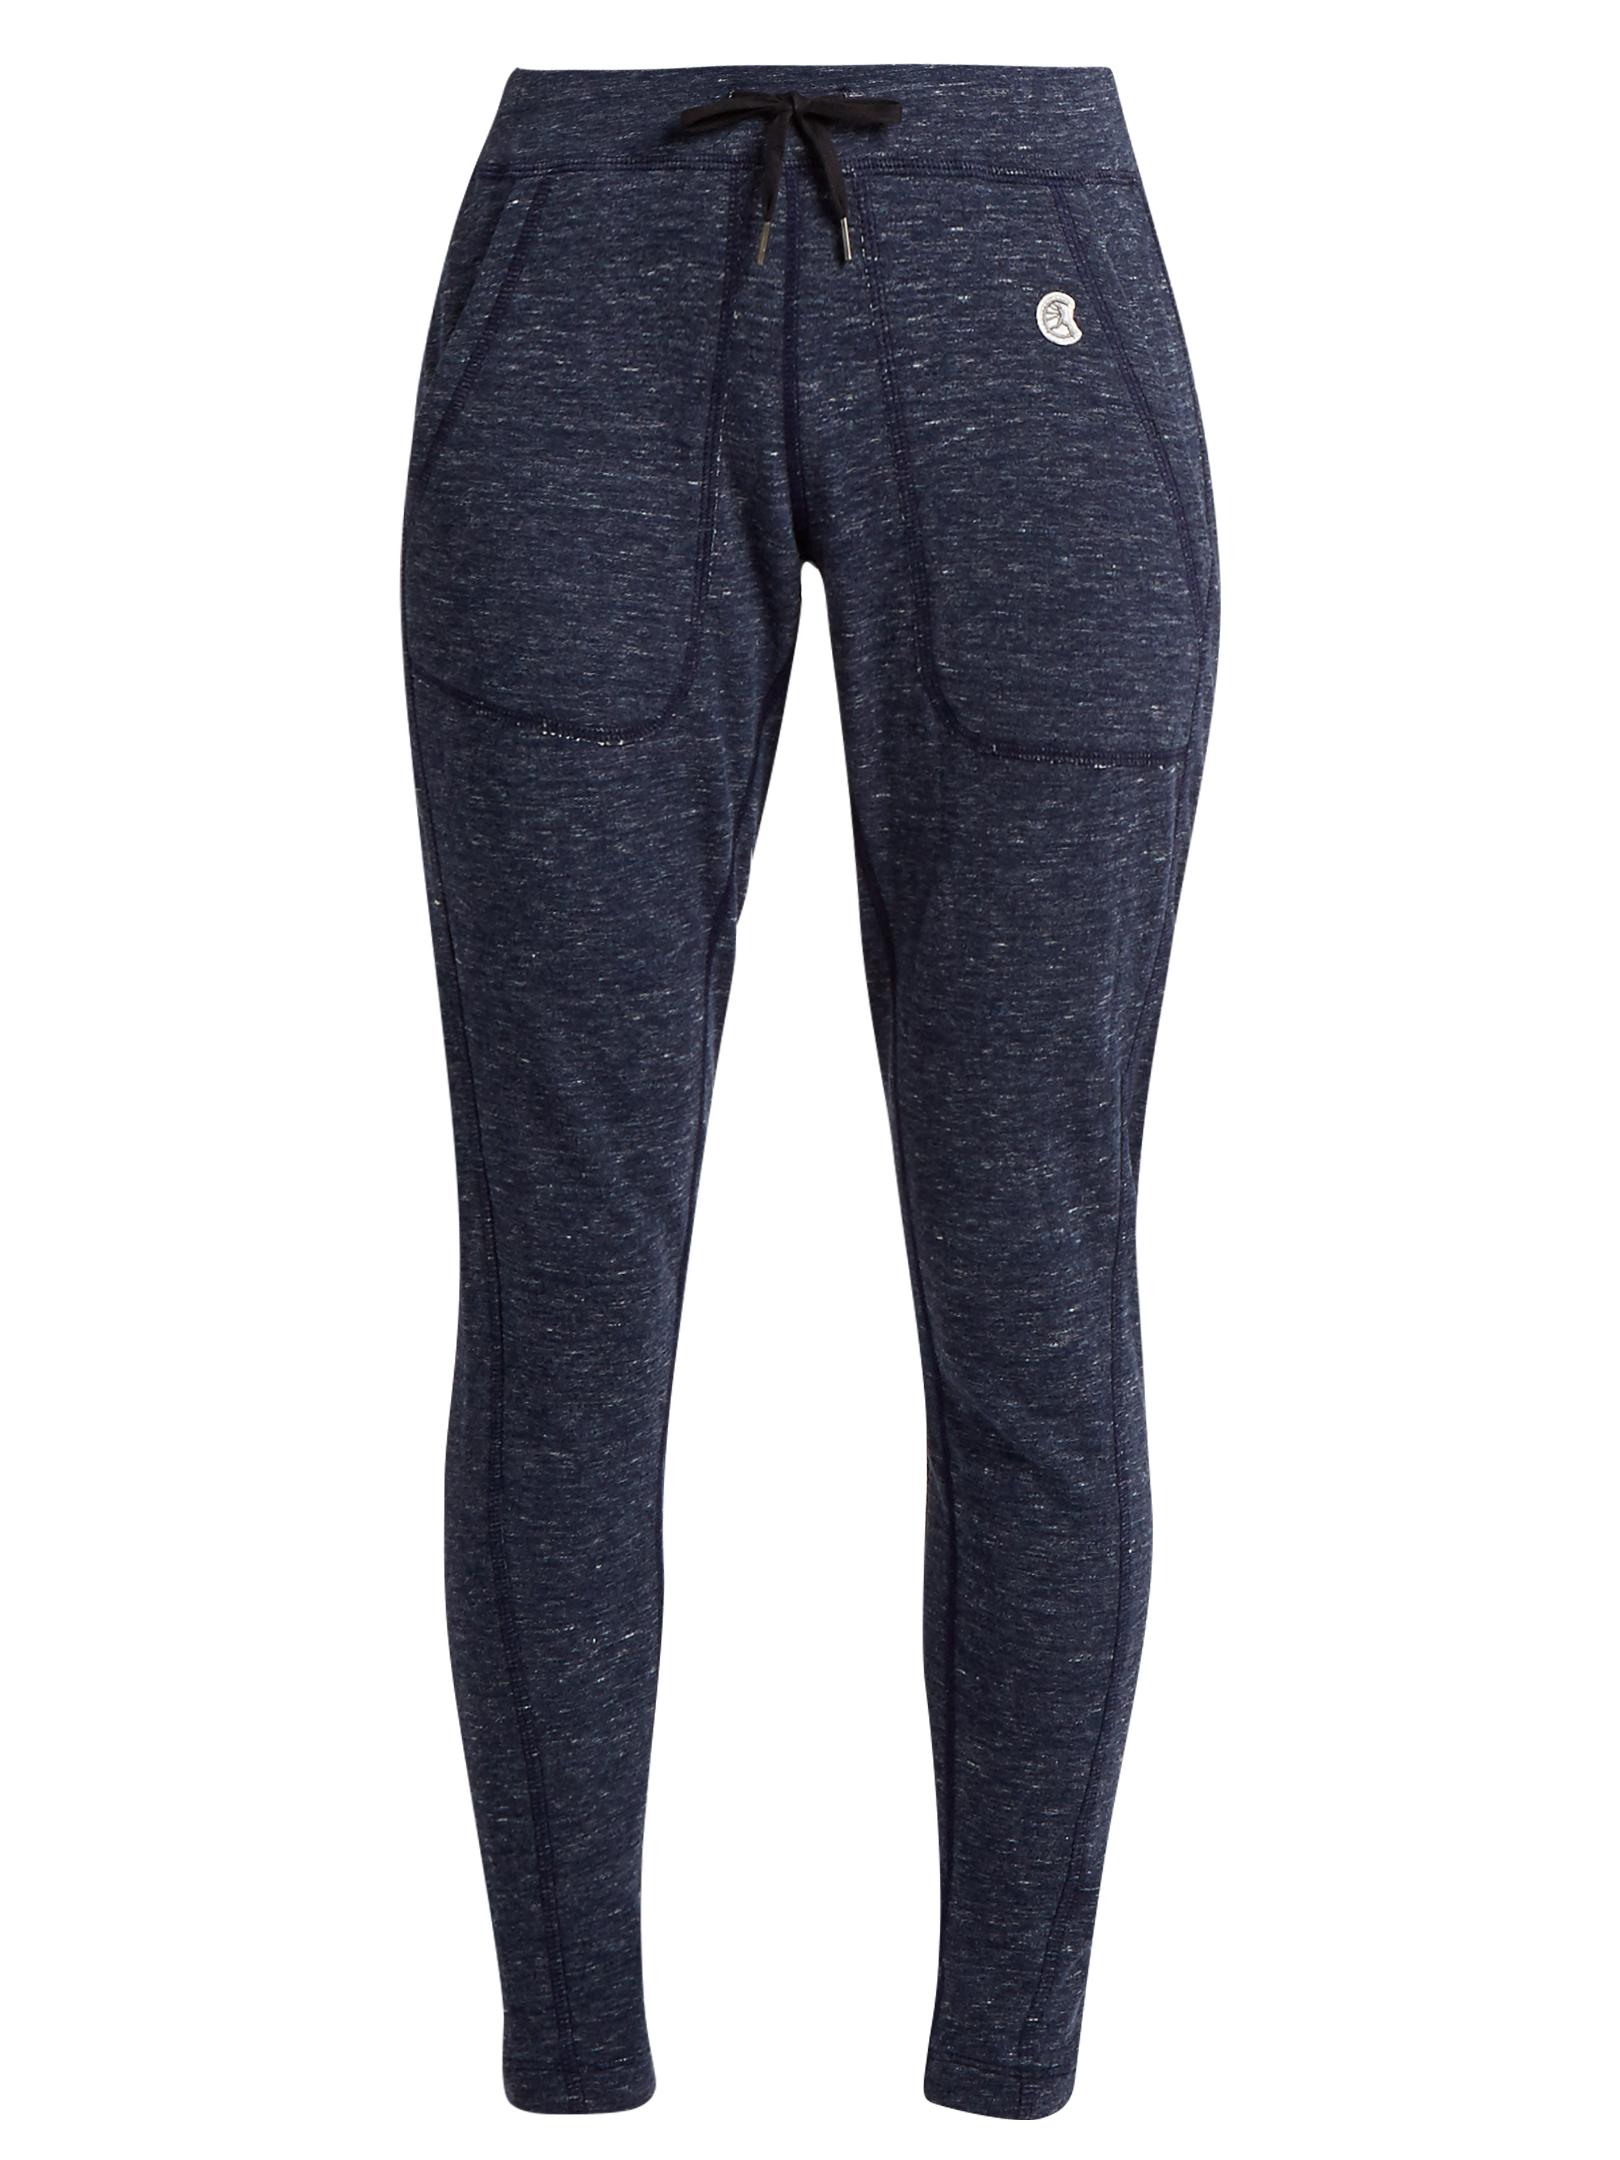 Original Zoe Karssen Womens Cottonblend Jersey Track Pants  Aoope